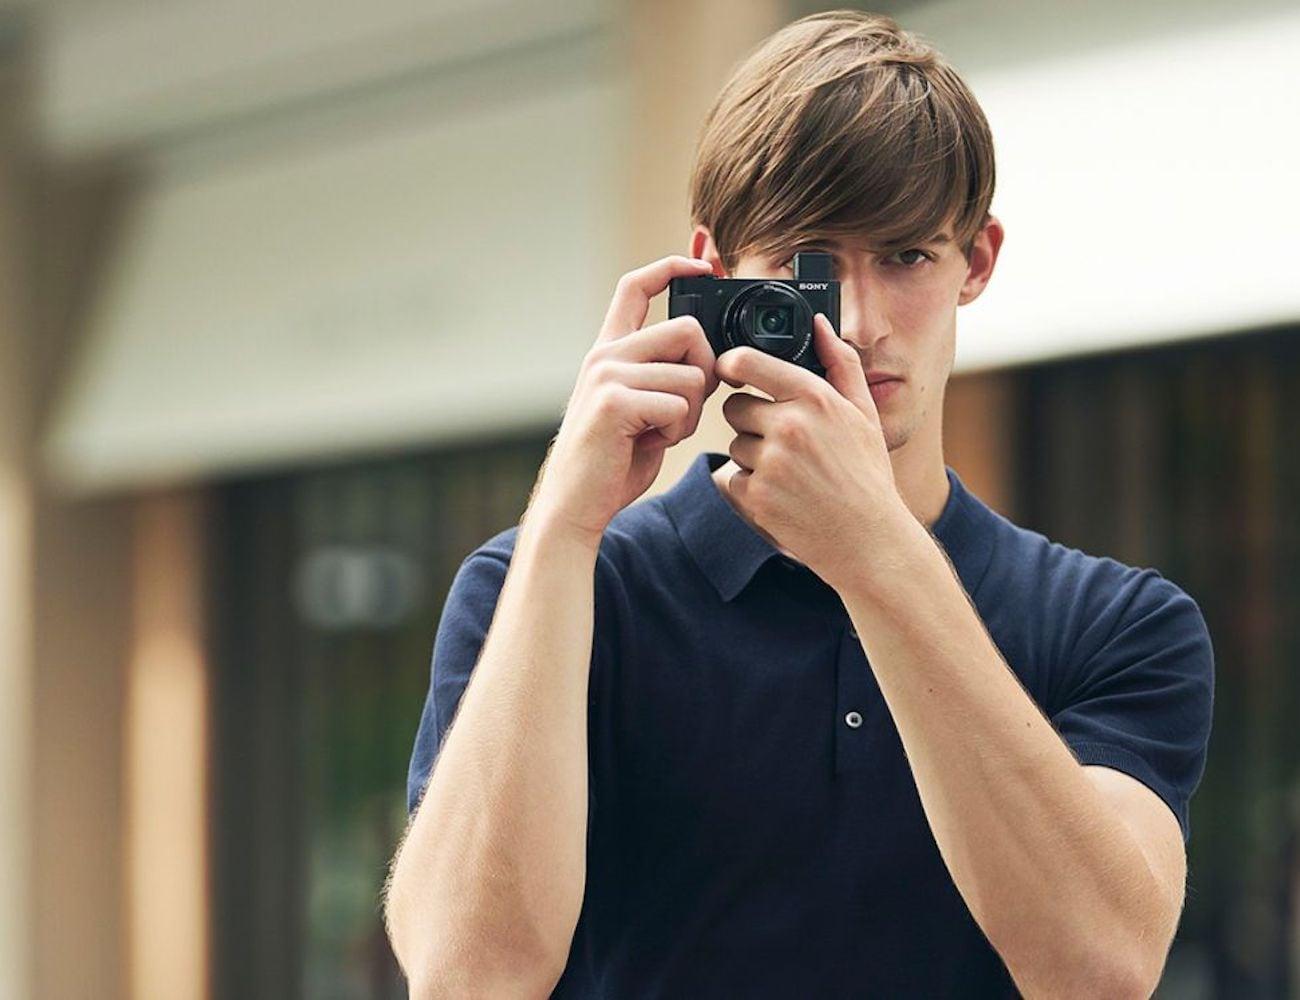 Sony HX99 Compact High-Zoom 4K Camera